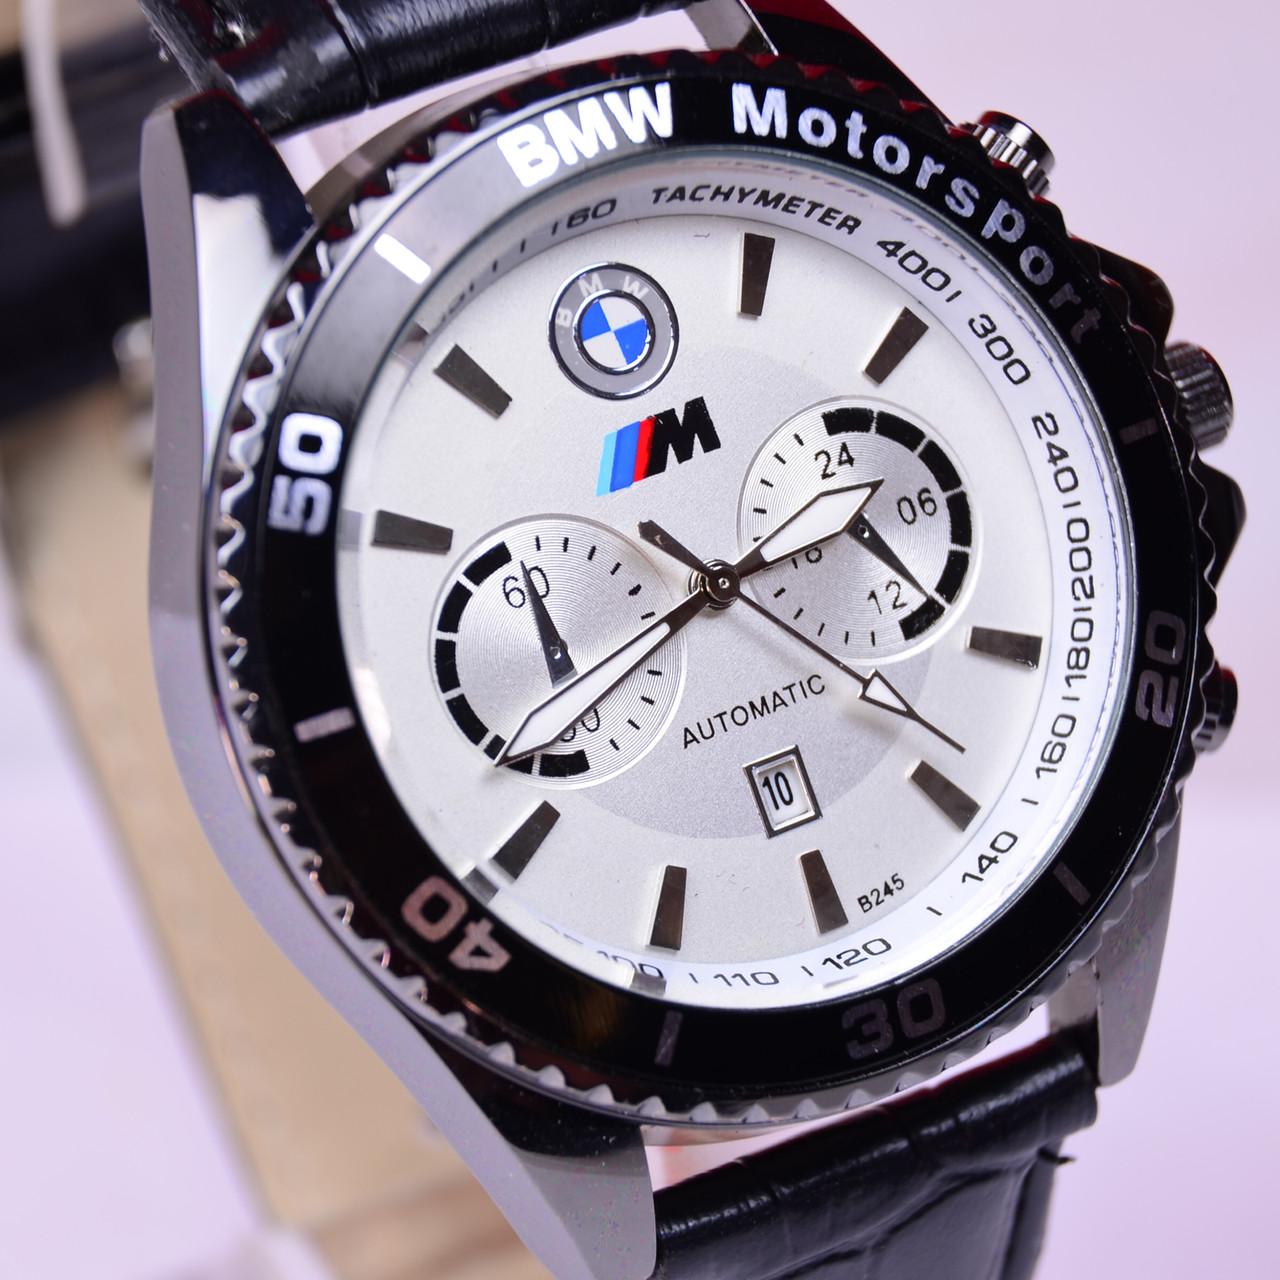 2548e8dd Мужские наручные часы BMW (B243) кварц календарь белый циферблат - интернет-  магазин